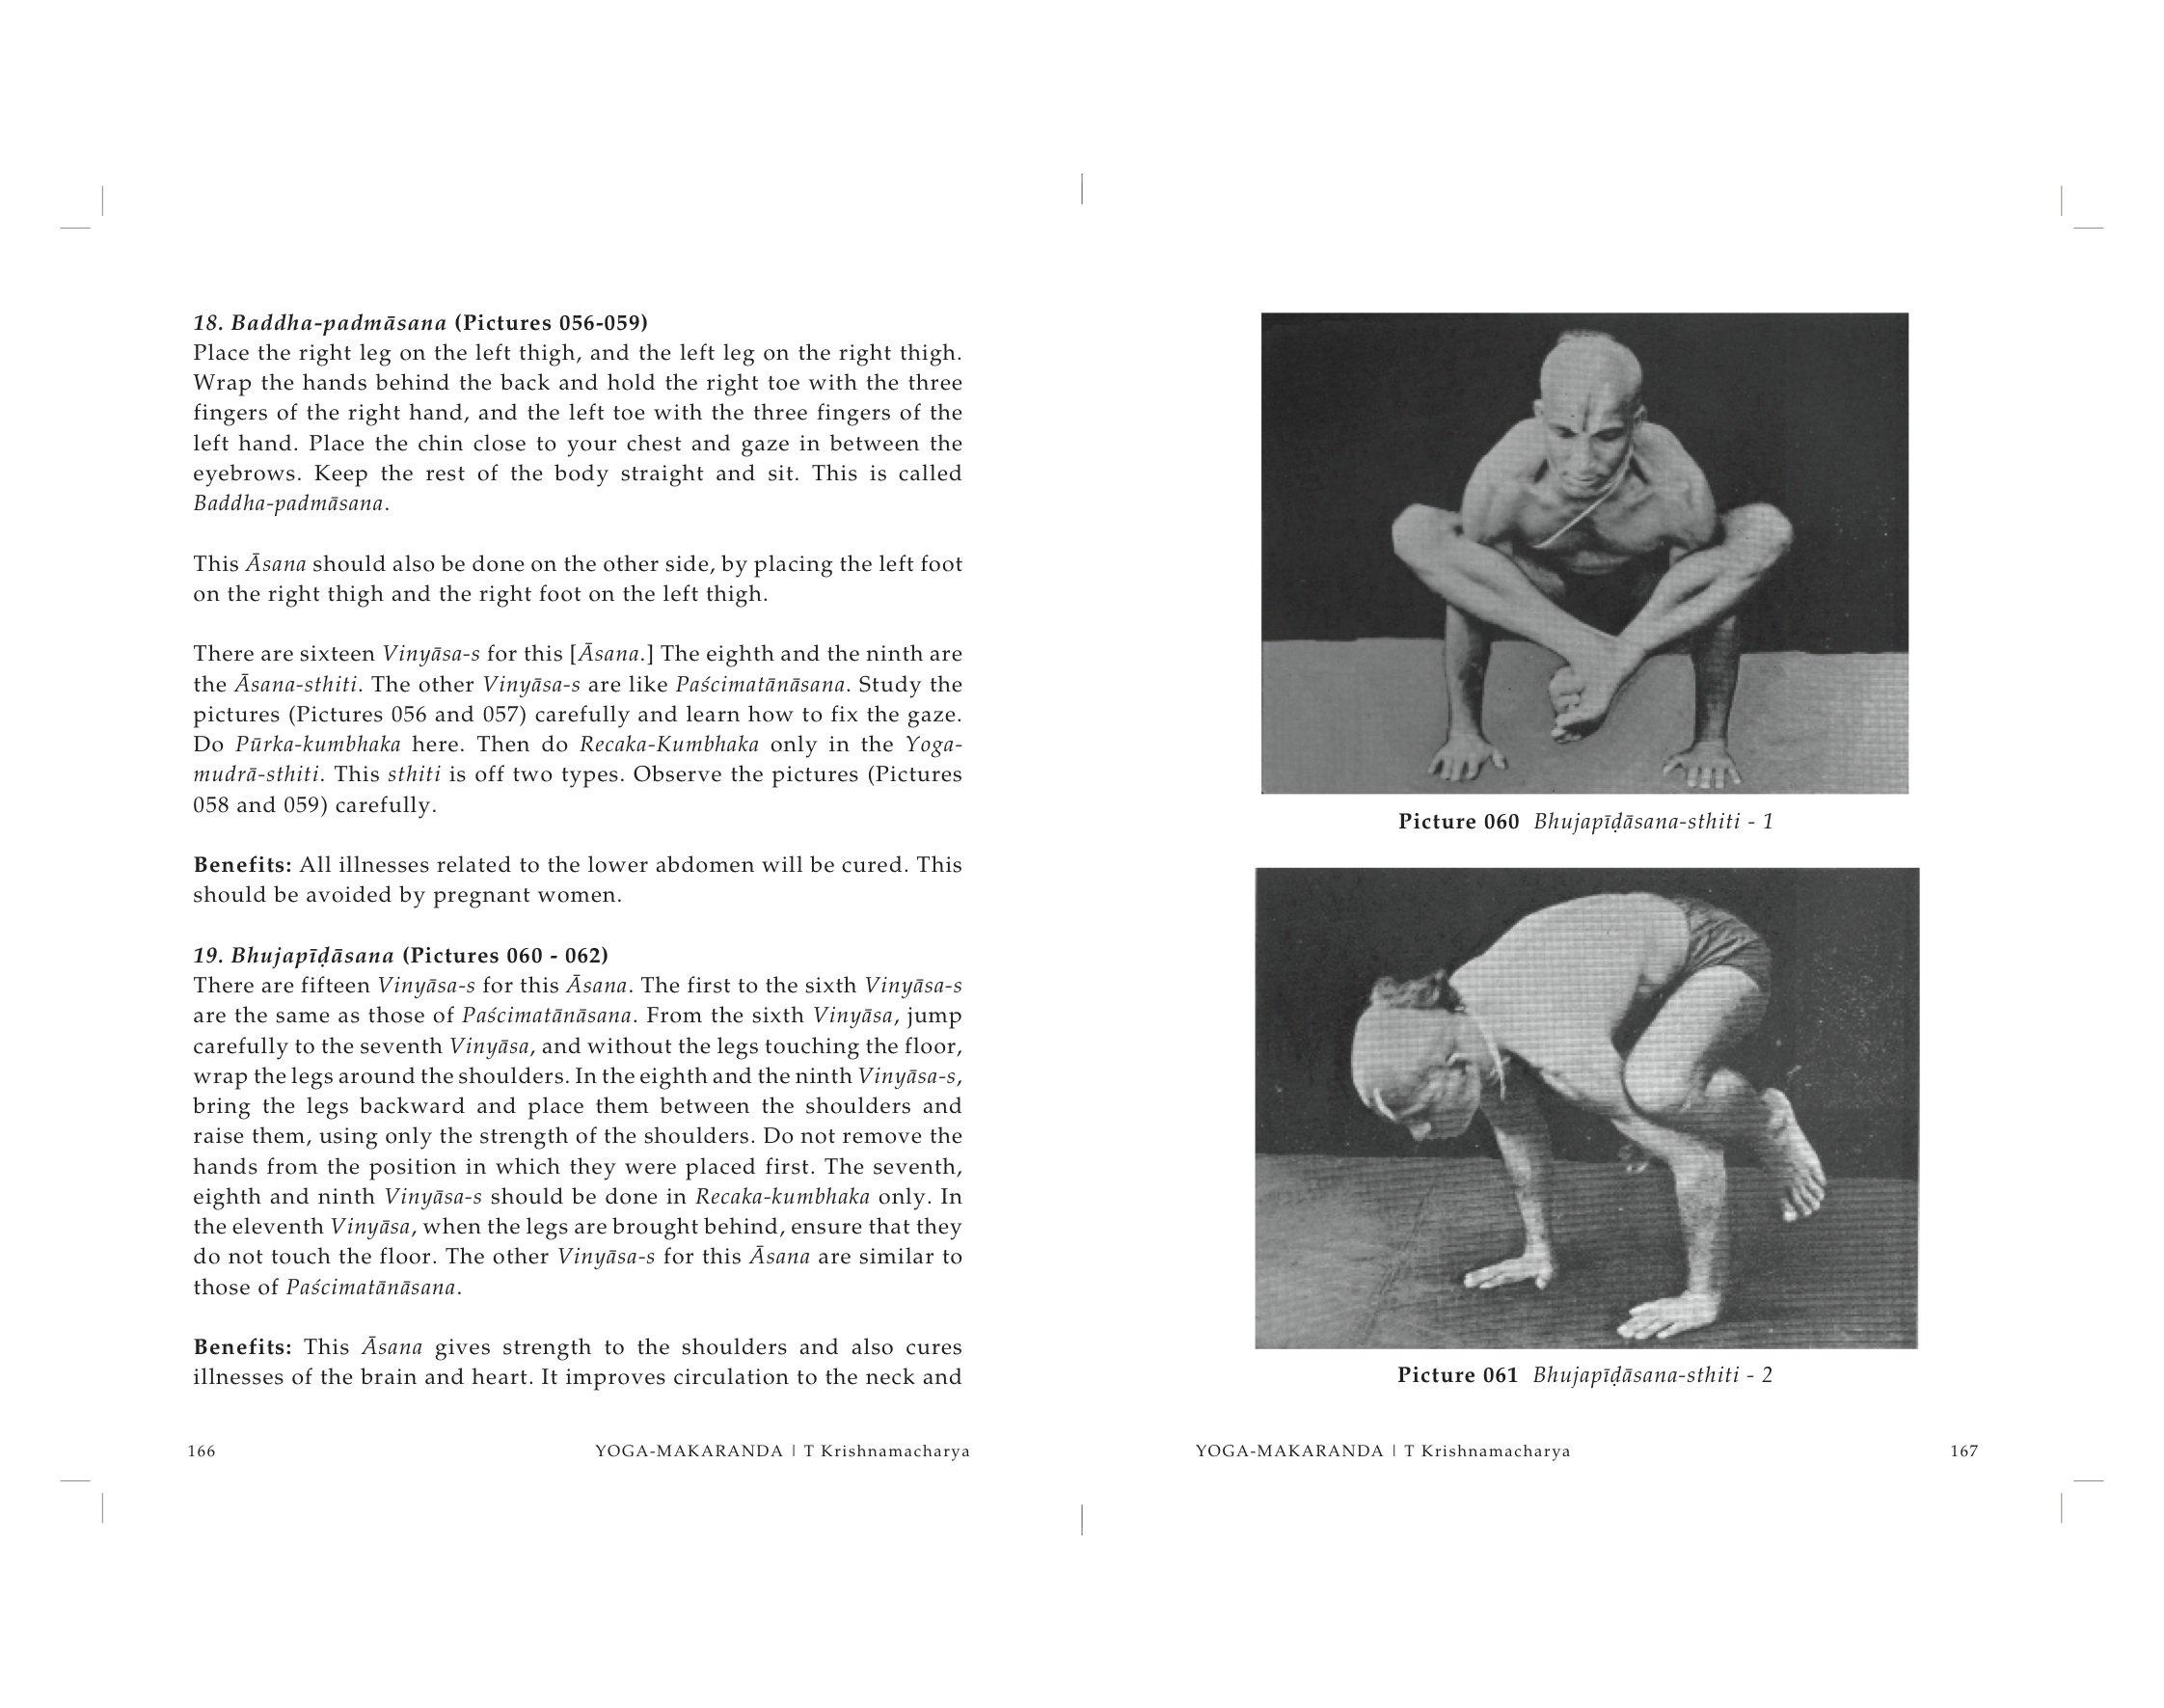 Amazon.com: Yoga Makaranda: The Nectar of Yoga ...